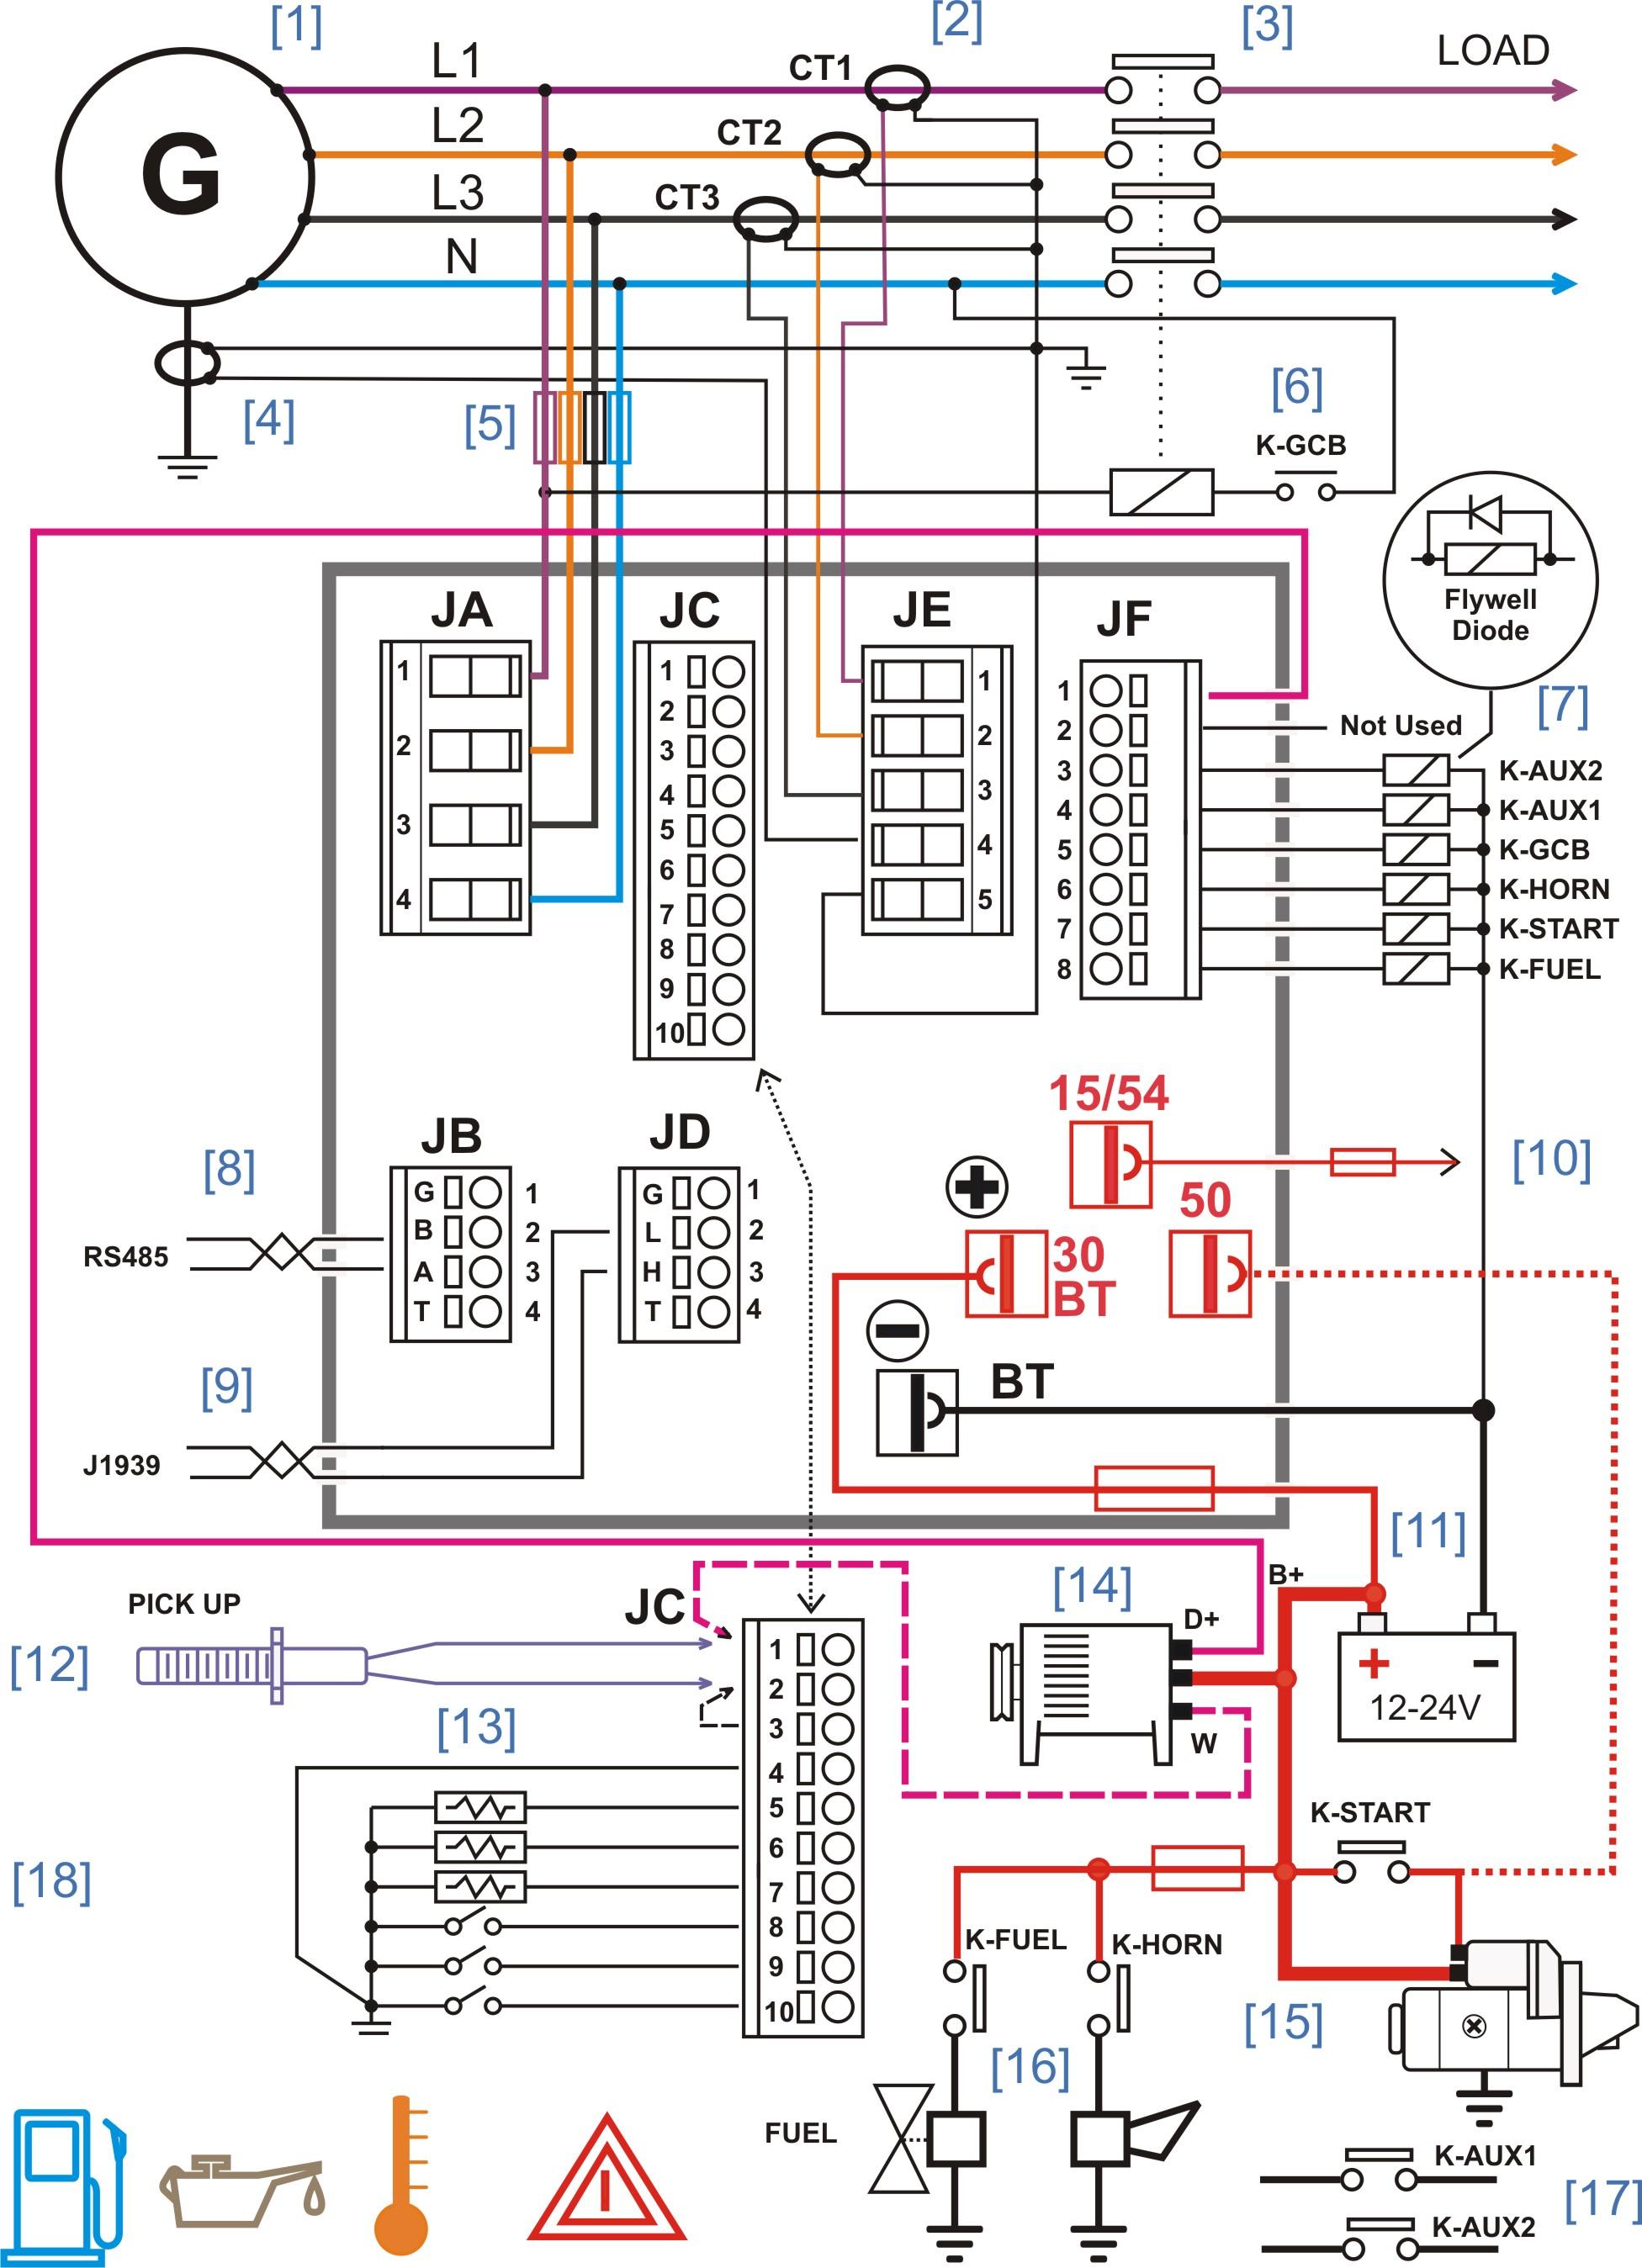 generac gp5000 generator wiring diagrams wiring diagram user